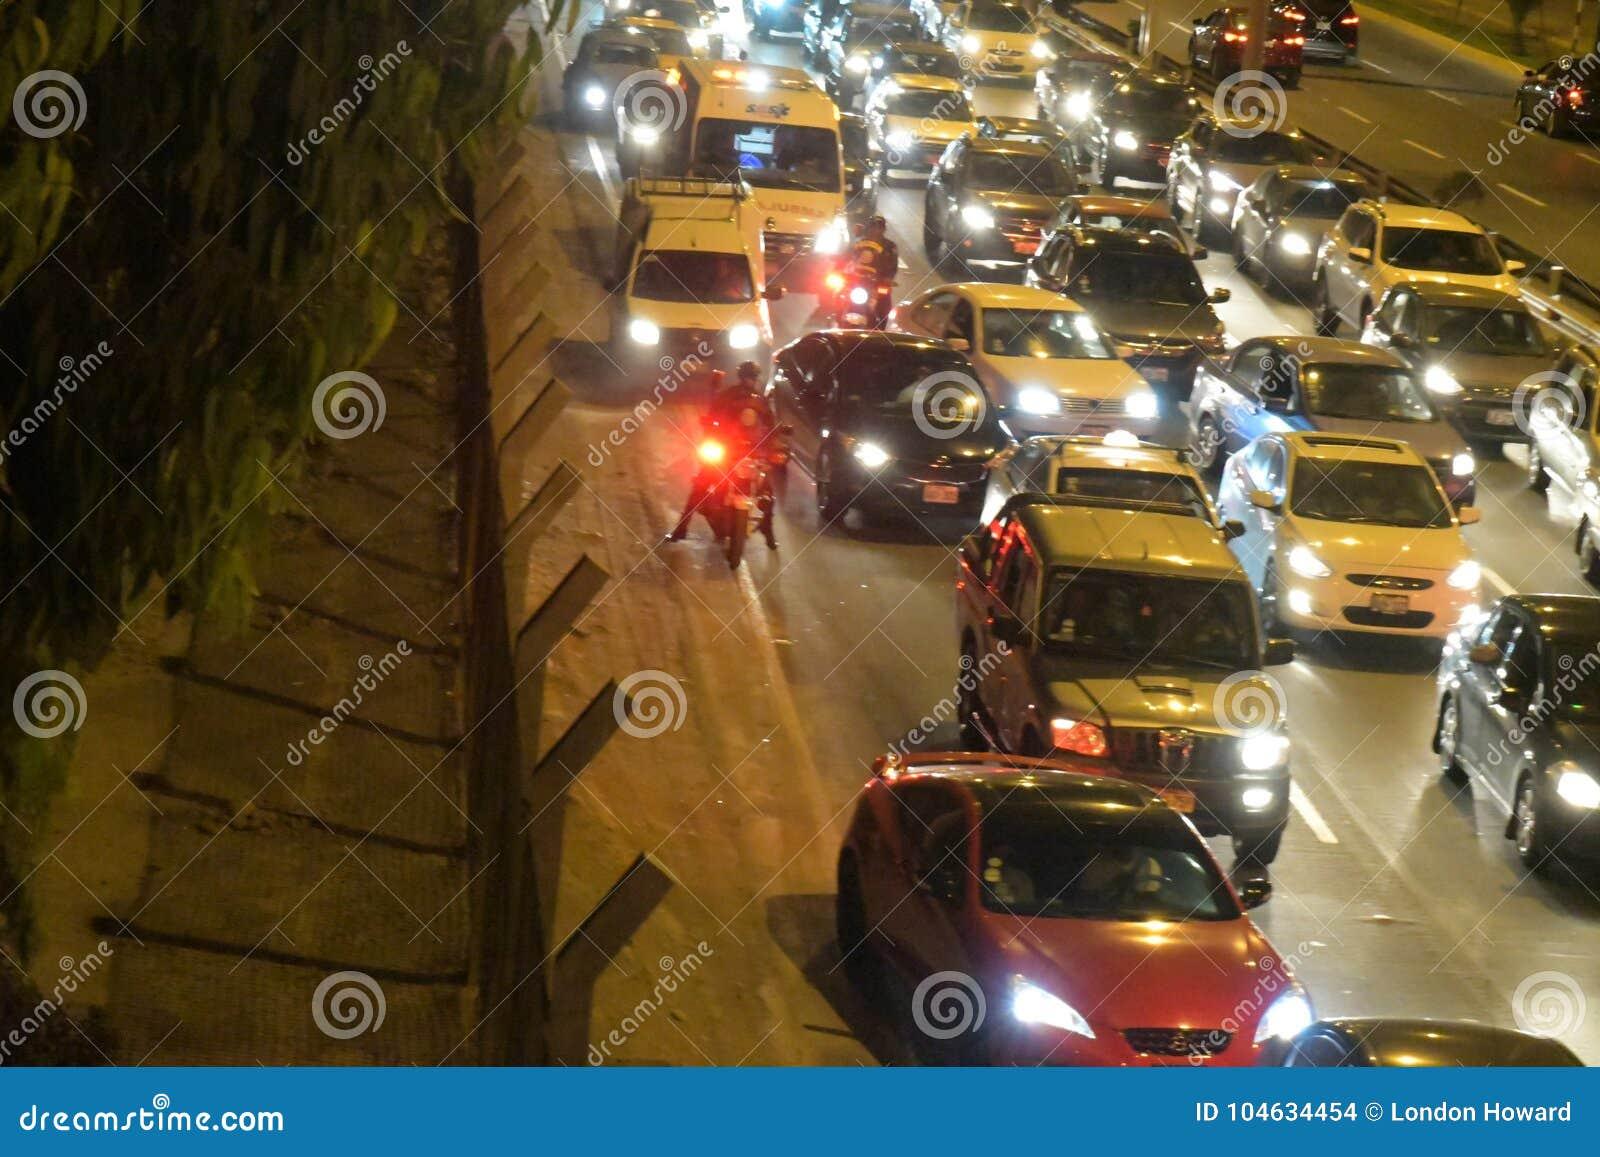 Download Wat Enkel Opstopping In San Miguel, Peru Redactionele Stock Afbeelding - Afbeelding bestaande uit koplampen, roadside: 104634454